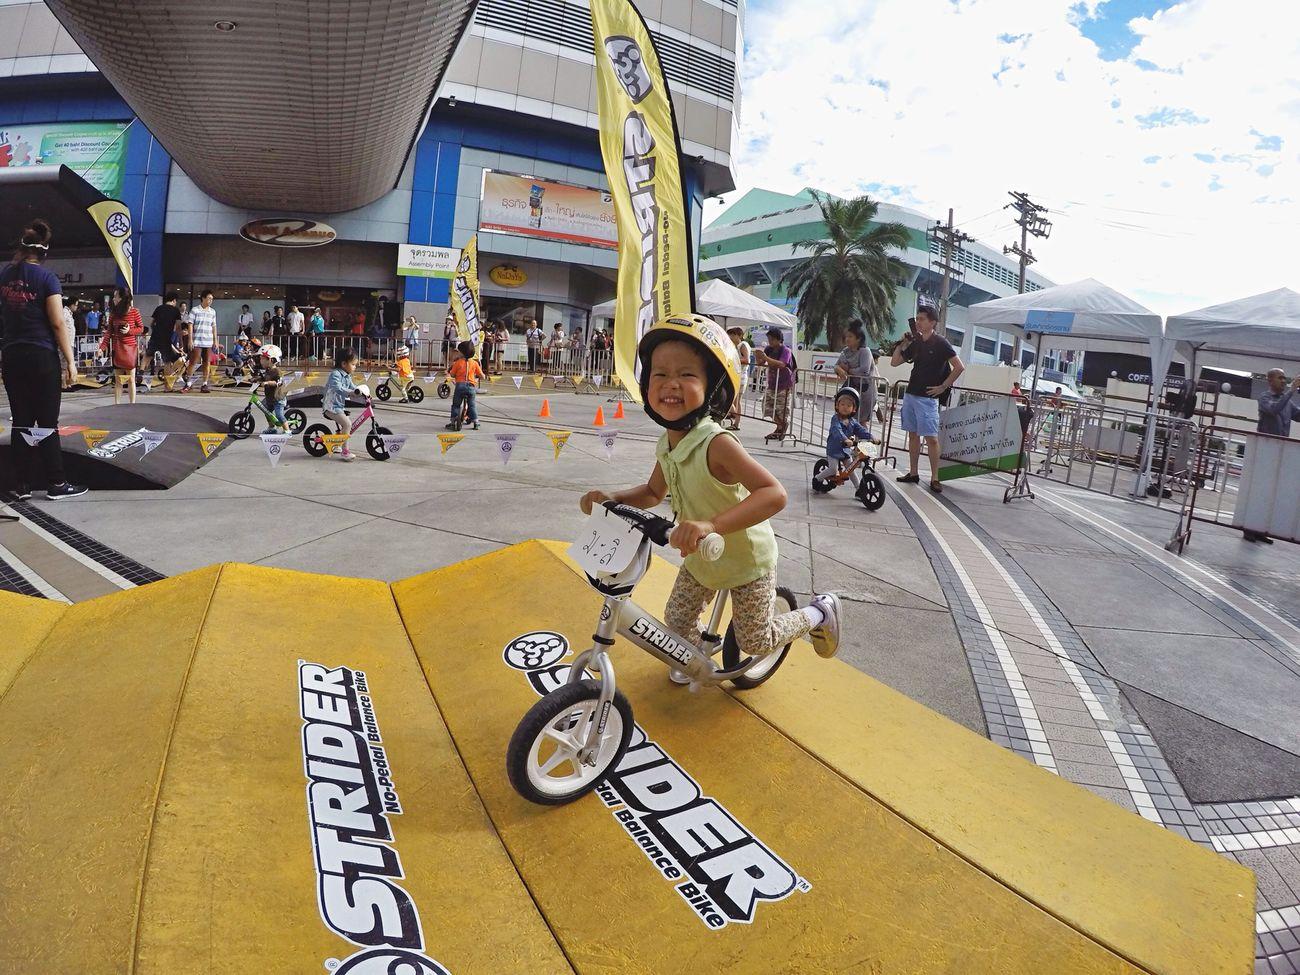 Marisa   June 21, 2015. Everyday Lives Everyday Joy Malidiary StrideOn Humanride Gopro GoPrography EyeEm Bangkok Open Edit